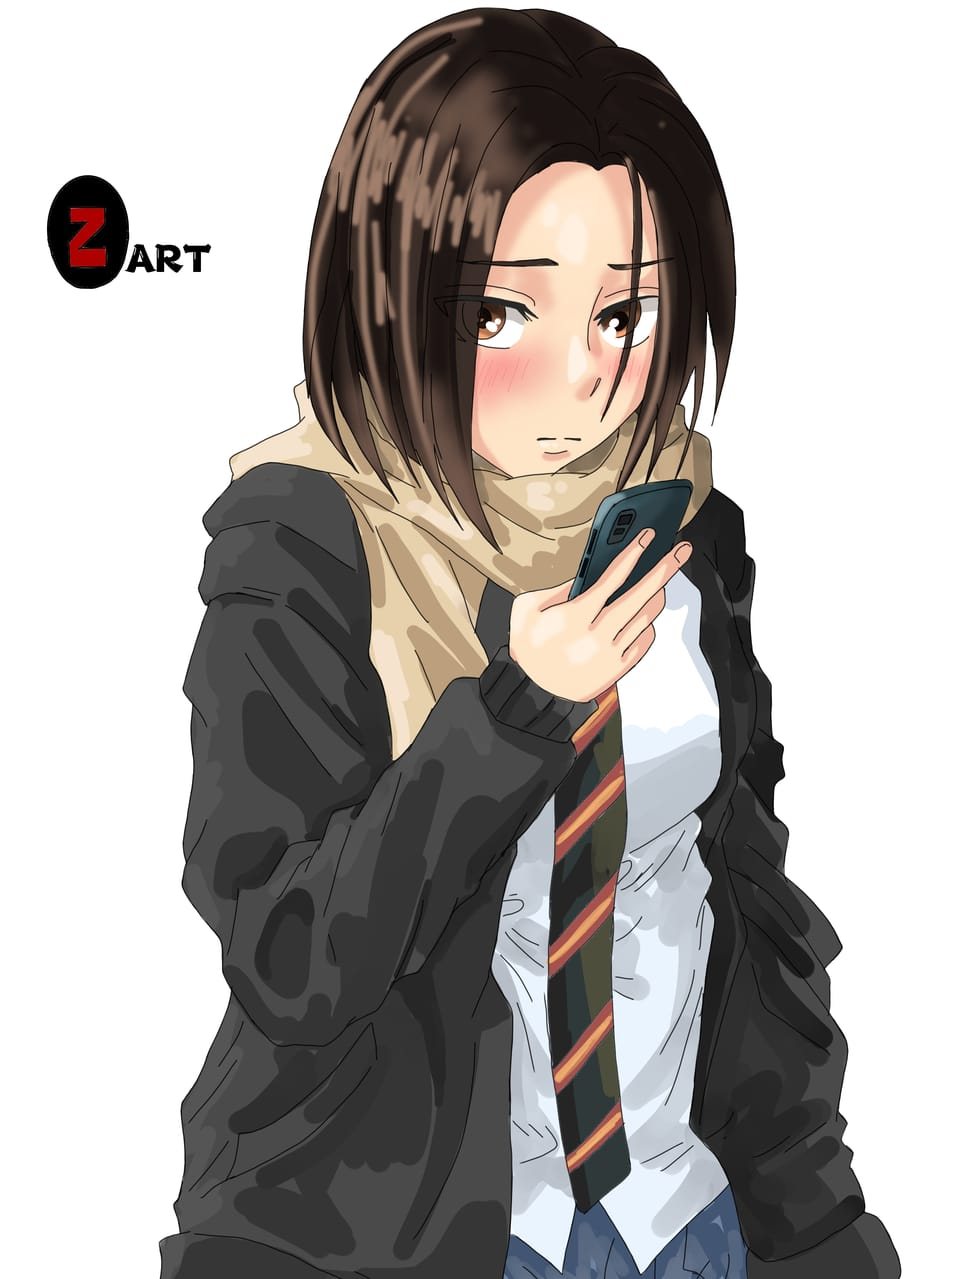 Girl in uniform. Illust of Yuri Black Zero uniform painting color cute request girl portrait medibangpaint illustration